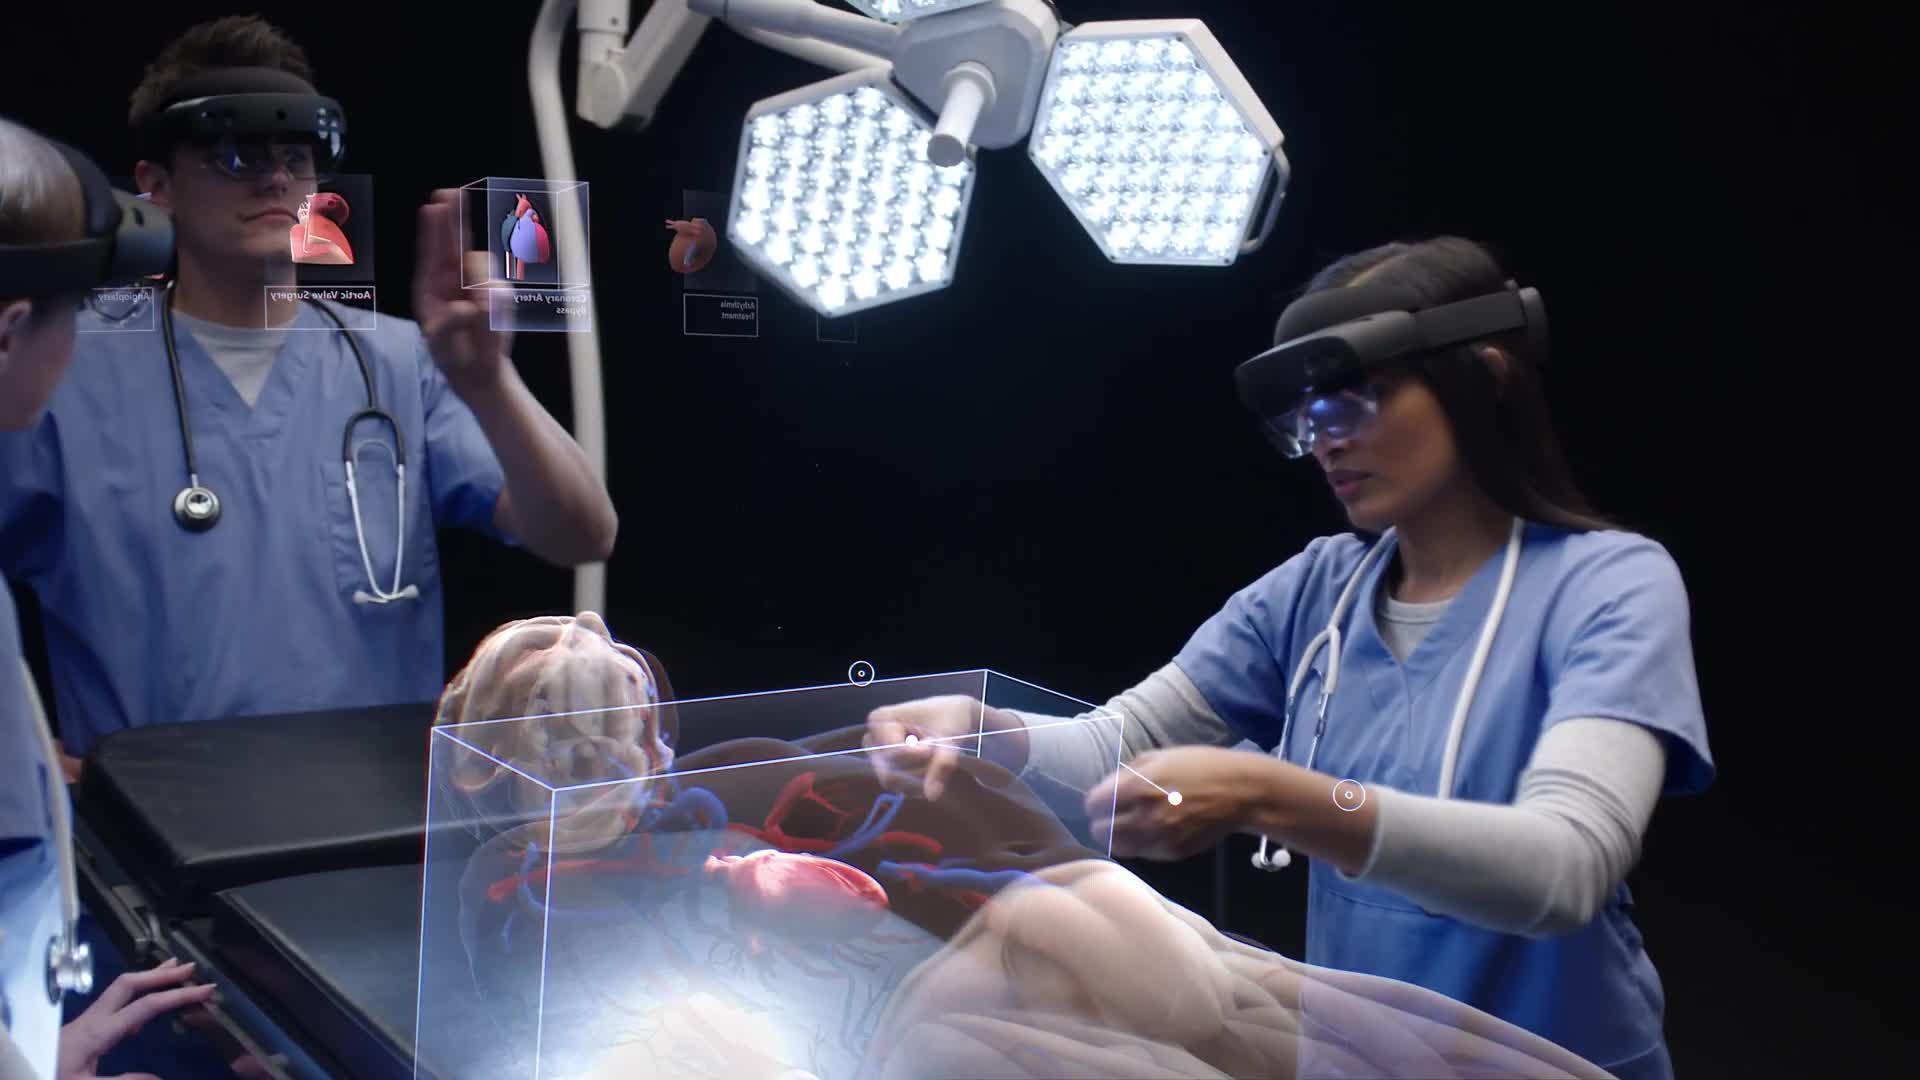 Microsoft, Mwc, Augmented Reality, Mobile World Congress, Augmented-Reality, MWC 2019, AR, Mobile World Congress 2019, HoloLens 2, Microsoft HoloLens 2, Augmented Reality Headset